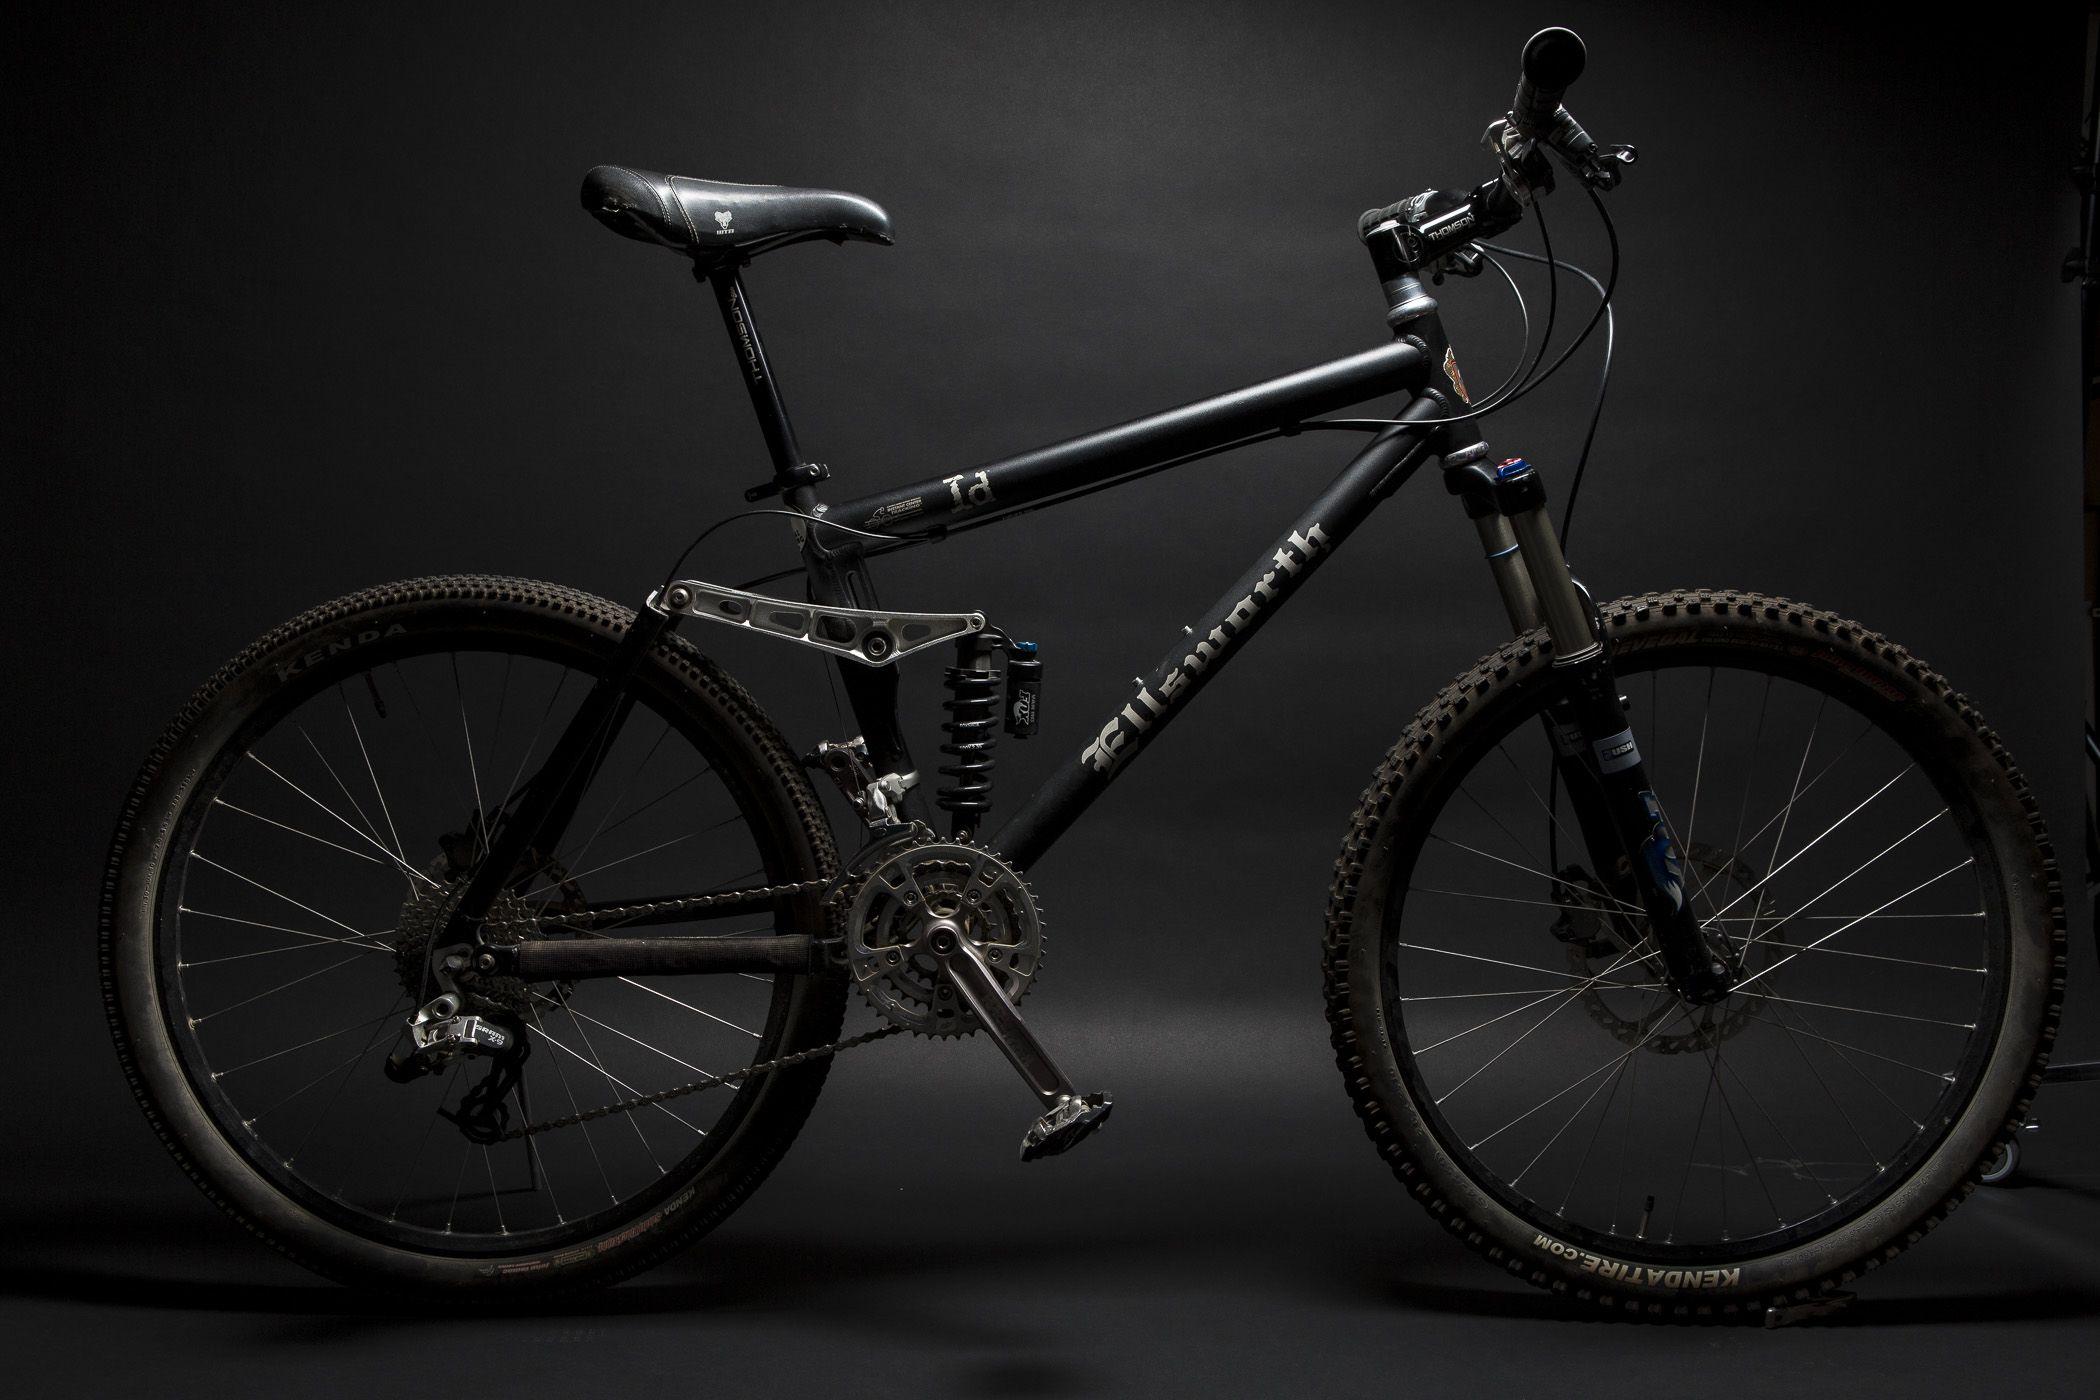 Kent Thruster Kz2600 Dual Suspension Mountain Bike Review Dual